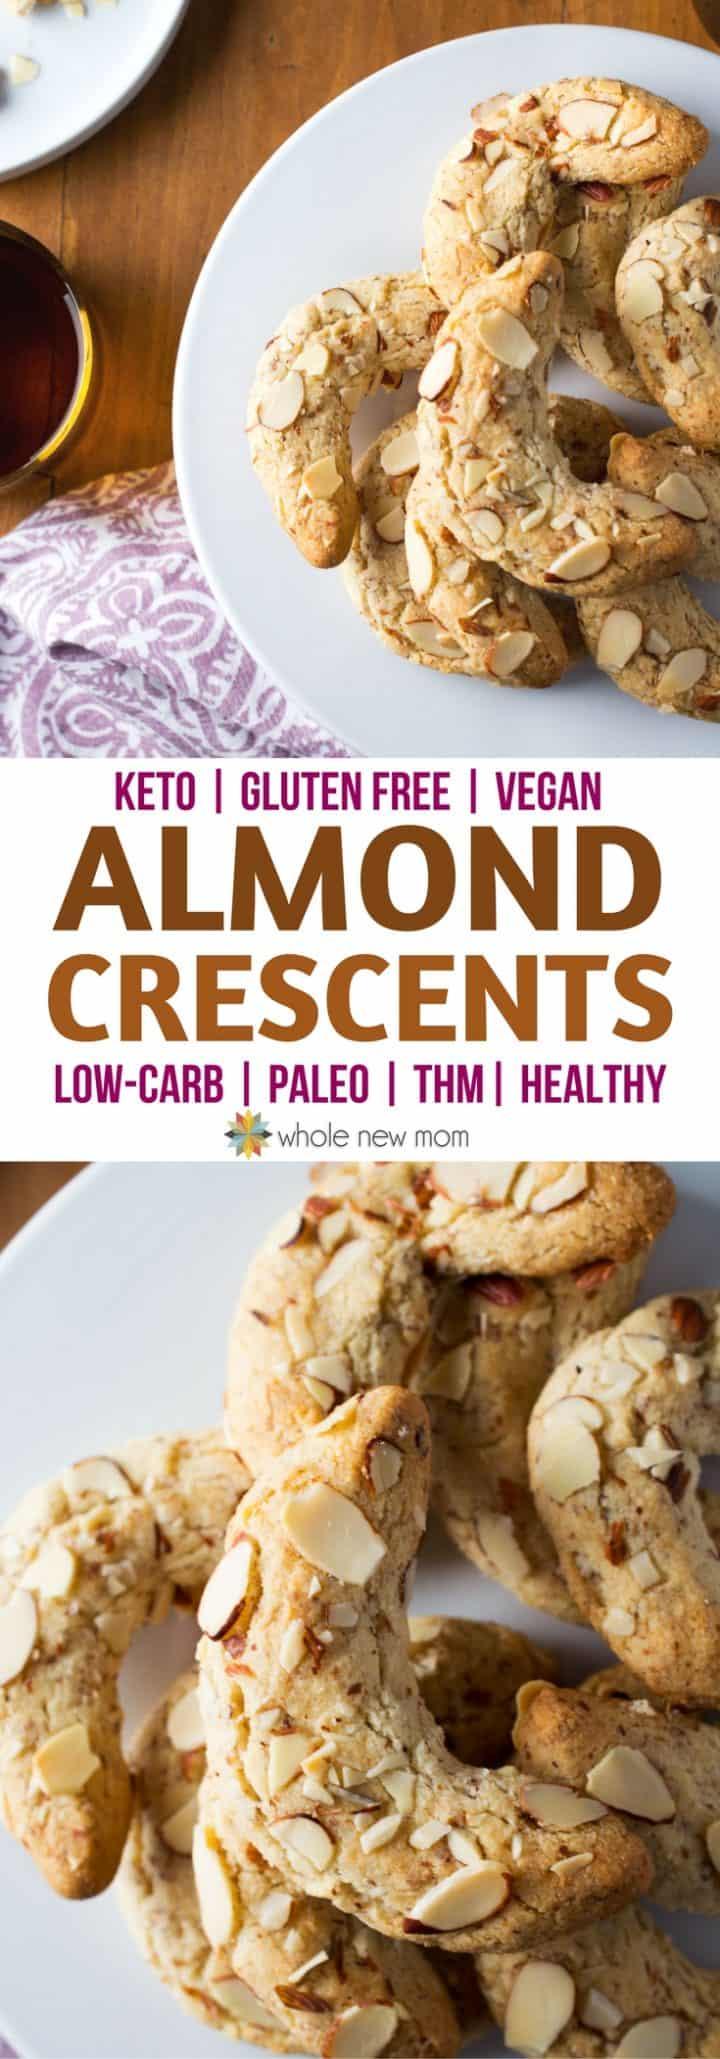 Almond Crescent Cookies - low carb, keto, sugar free, vegan option, paleo